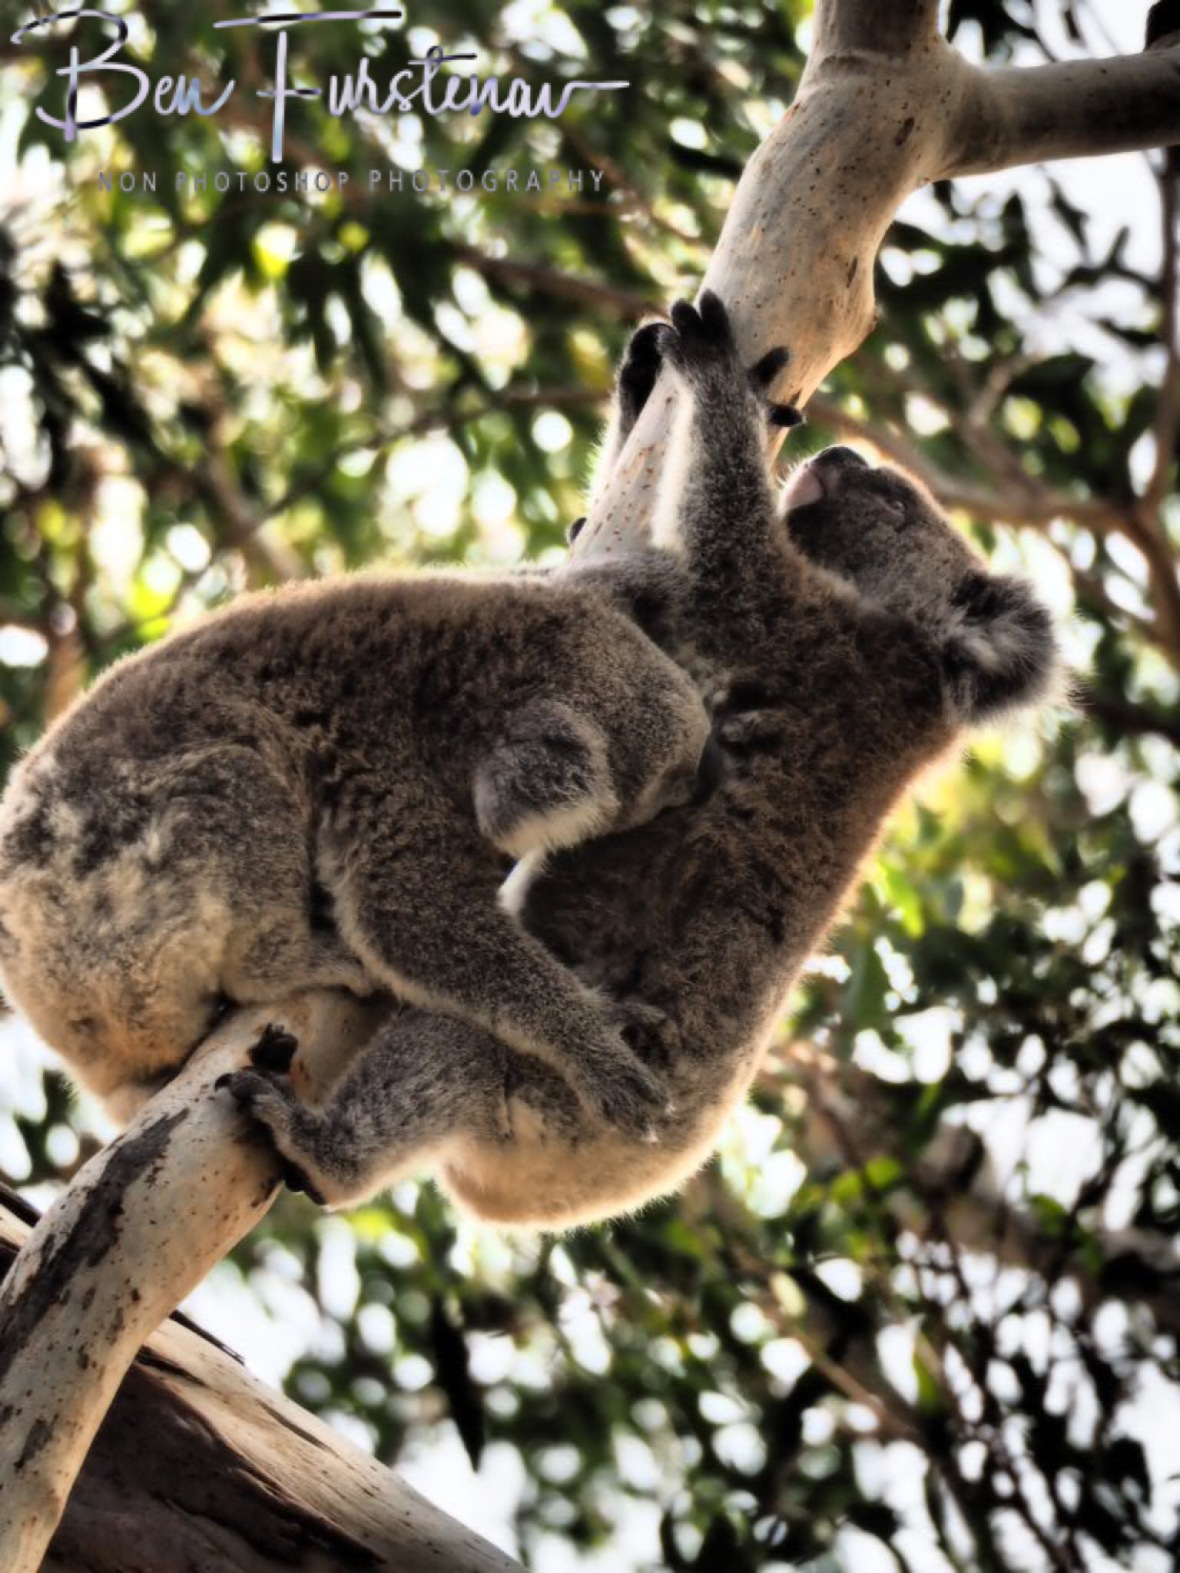 Koala fast food at Woodburn, Northern New South Wales, Australia